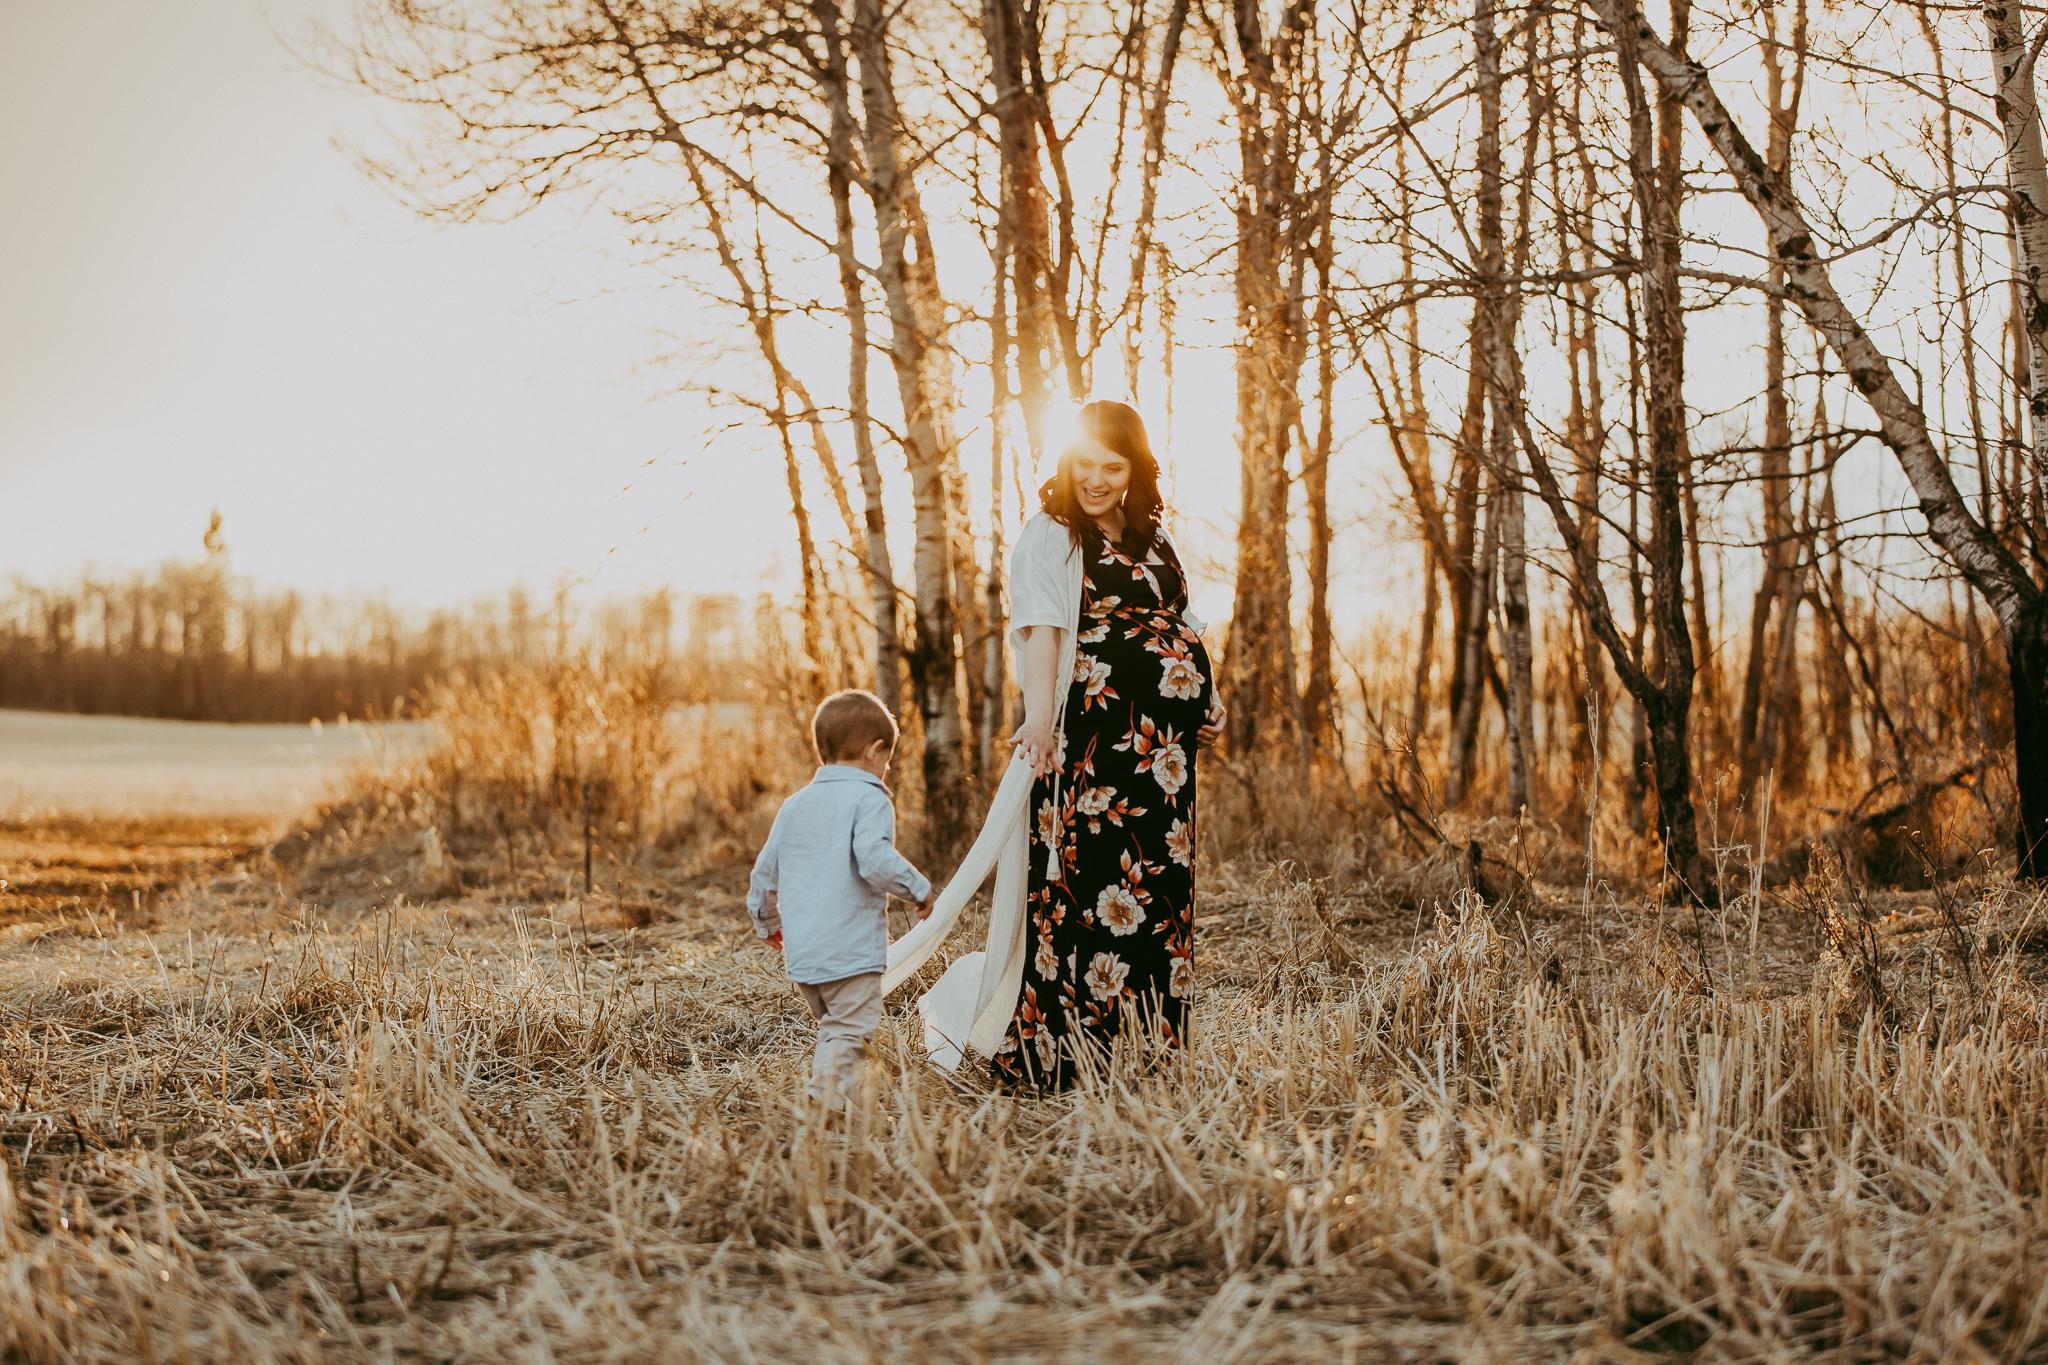 Alina-Joy-Photography-Cold-Lake-Maternity-Photographer-Josee-52.jpg